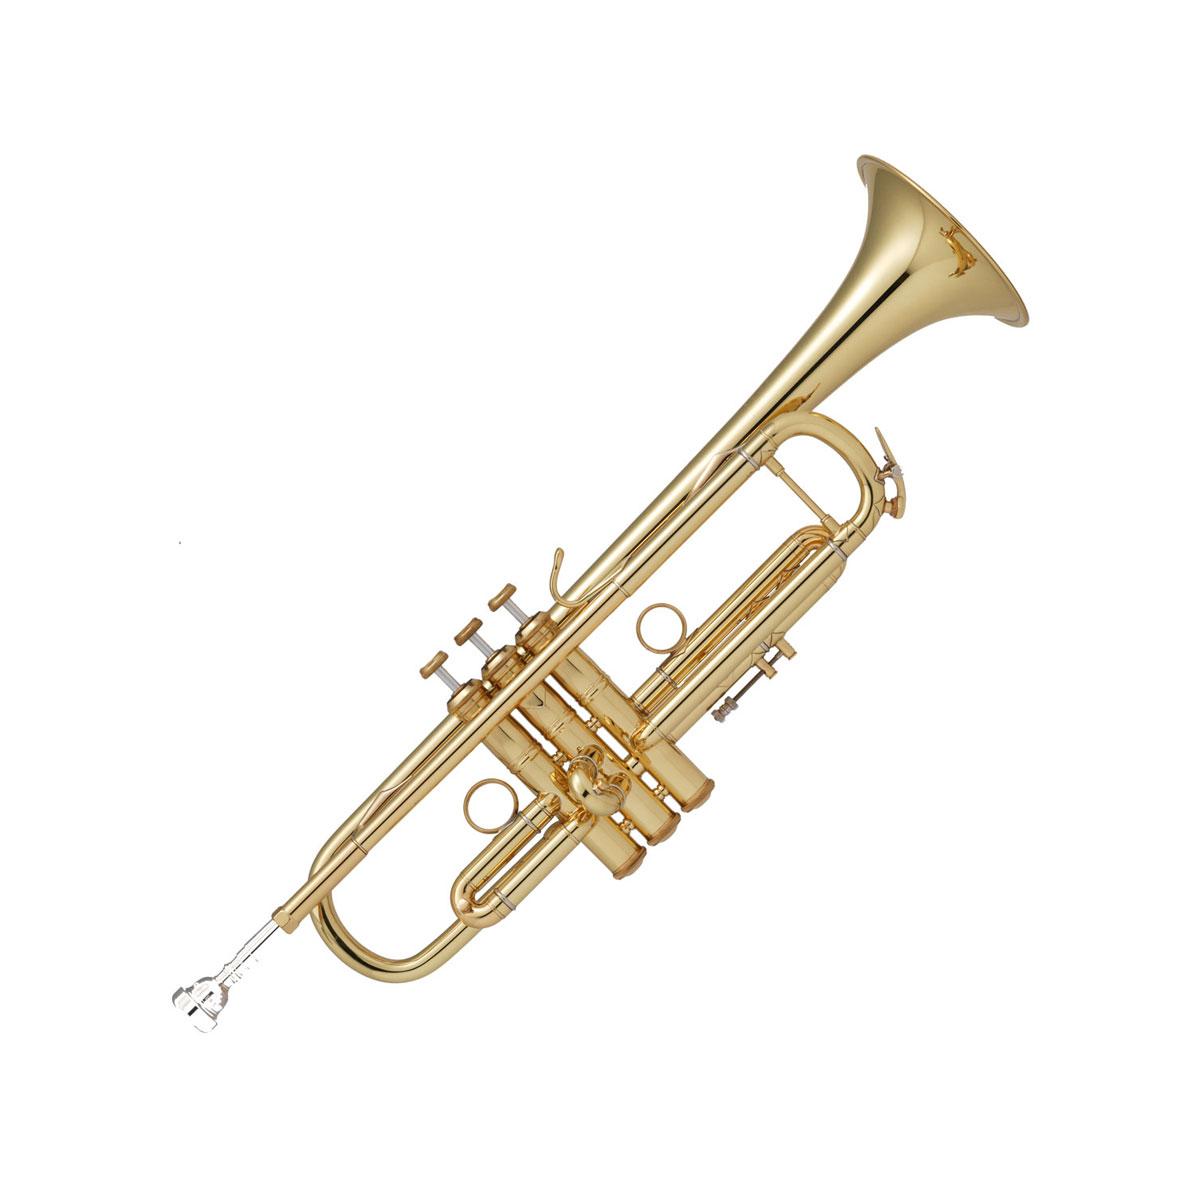 Bach / NEW YORK 7 GL バック ニューヨーク7 トランペット B♭ ラッカー仕上 【お取り寄せ】【5年保証】